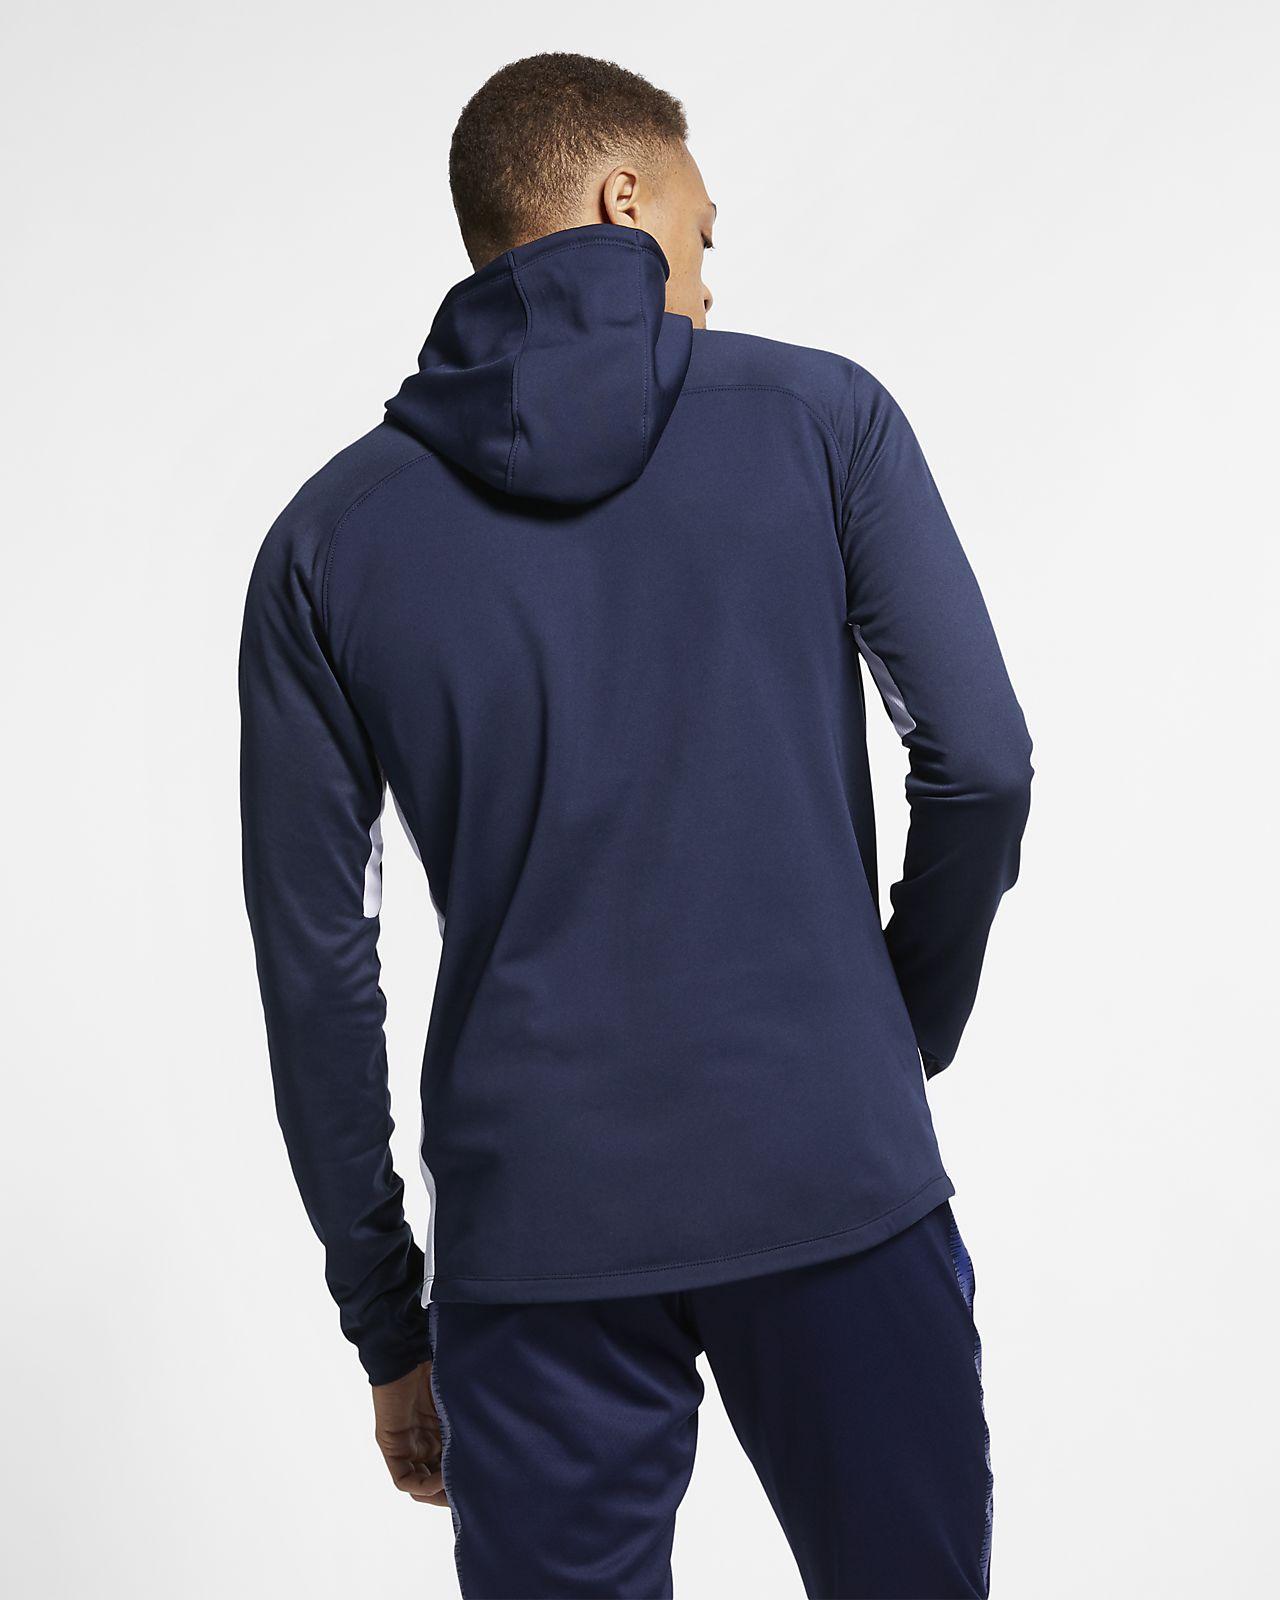 64b2e0bd Nike Dri-FIT Academy Men's Football Pullover Hoodie. Nike.com GB